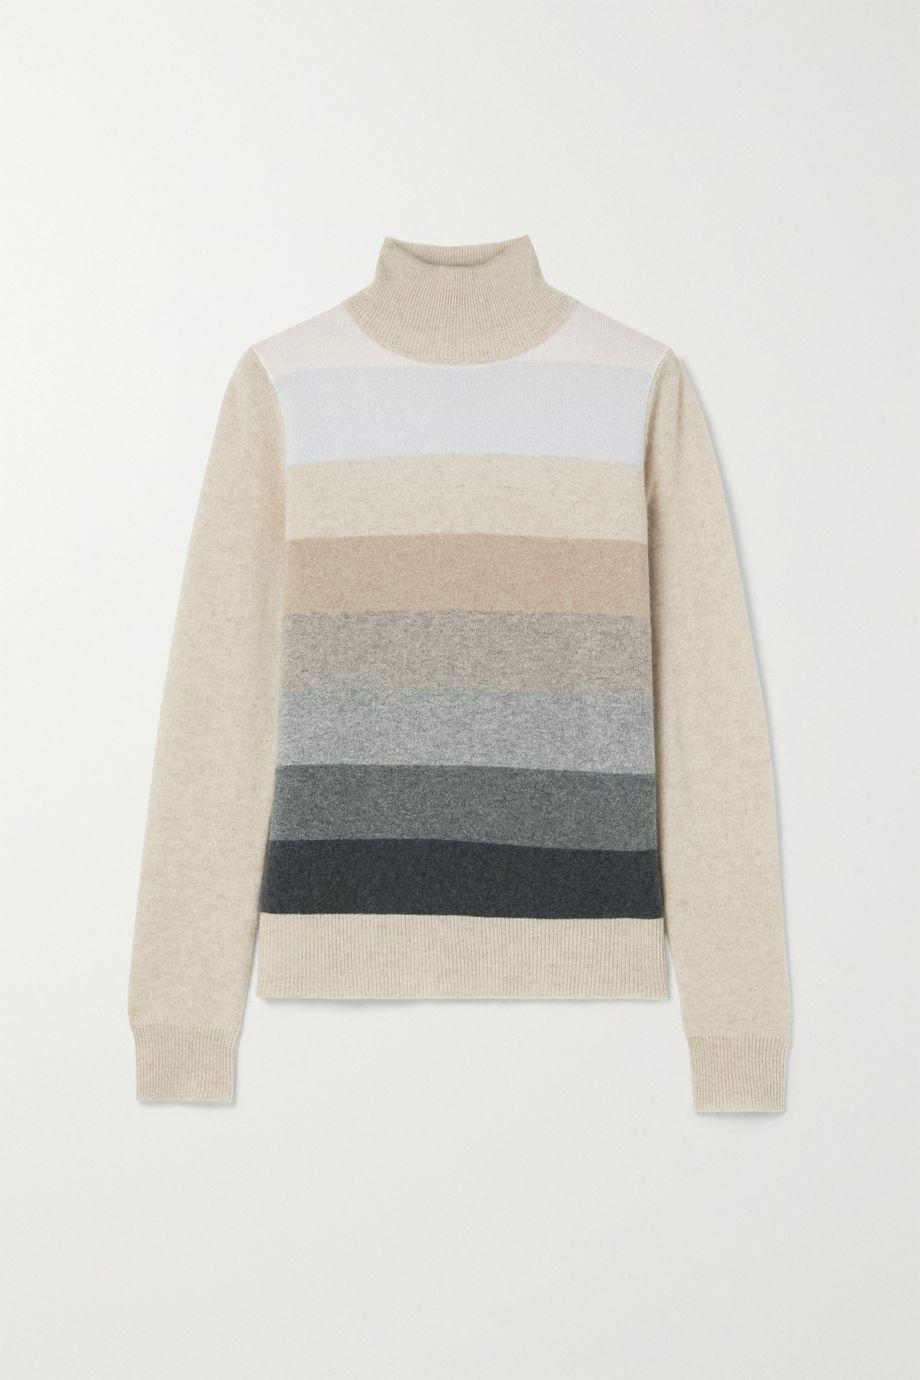 Madeleine Thompson Diana striped cashmere turtleneck sweater